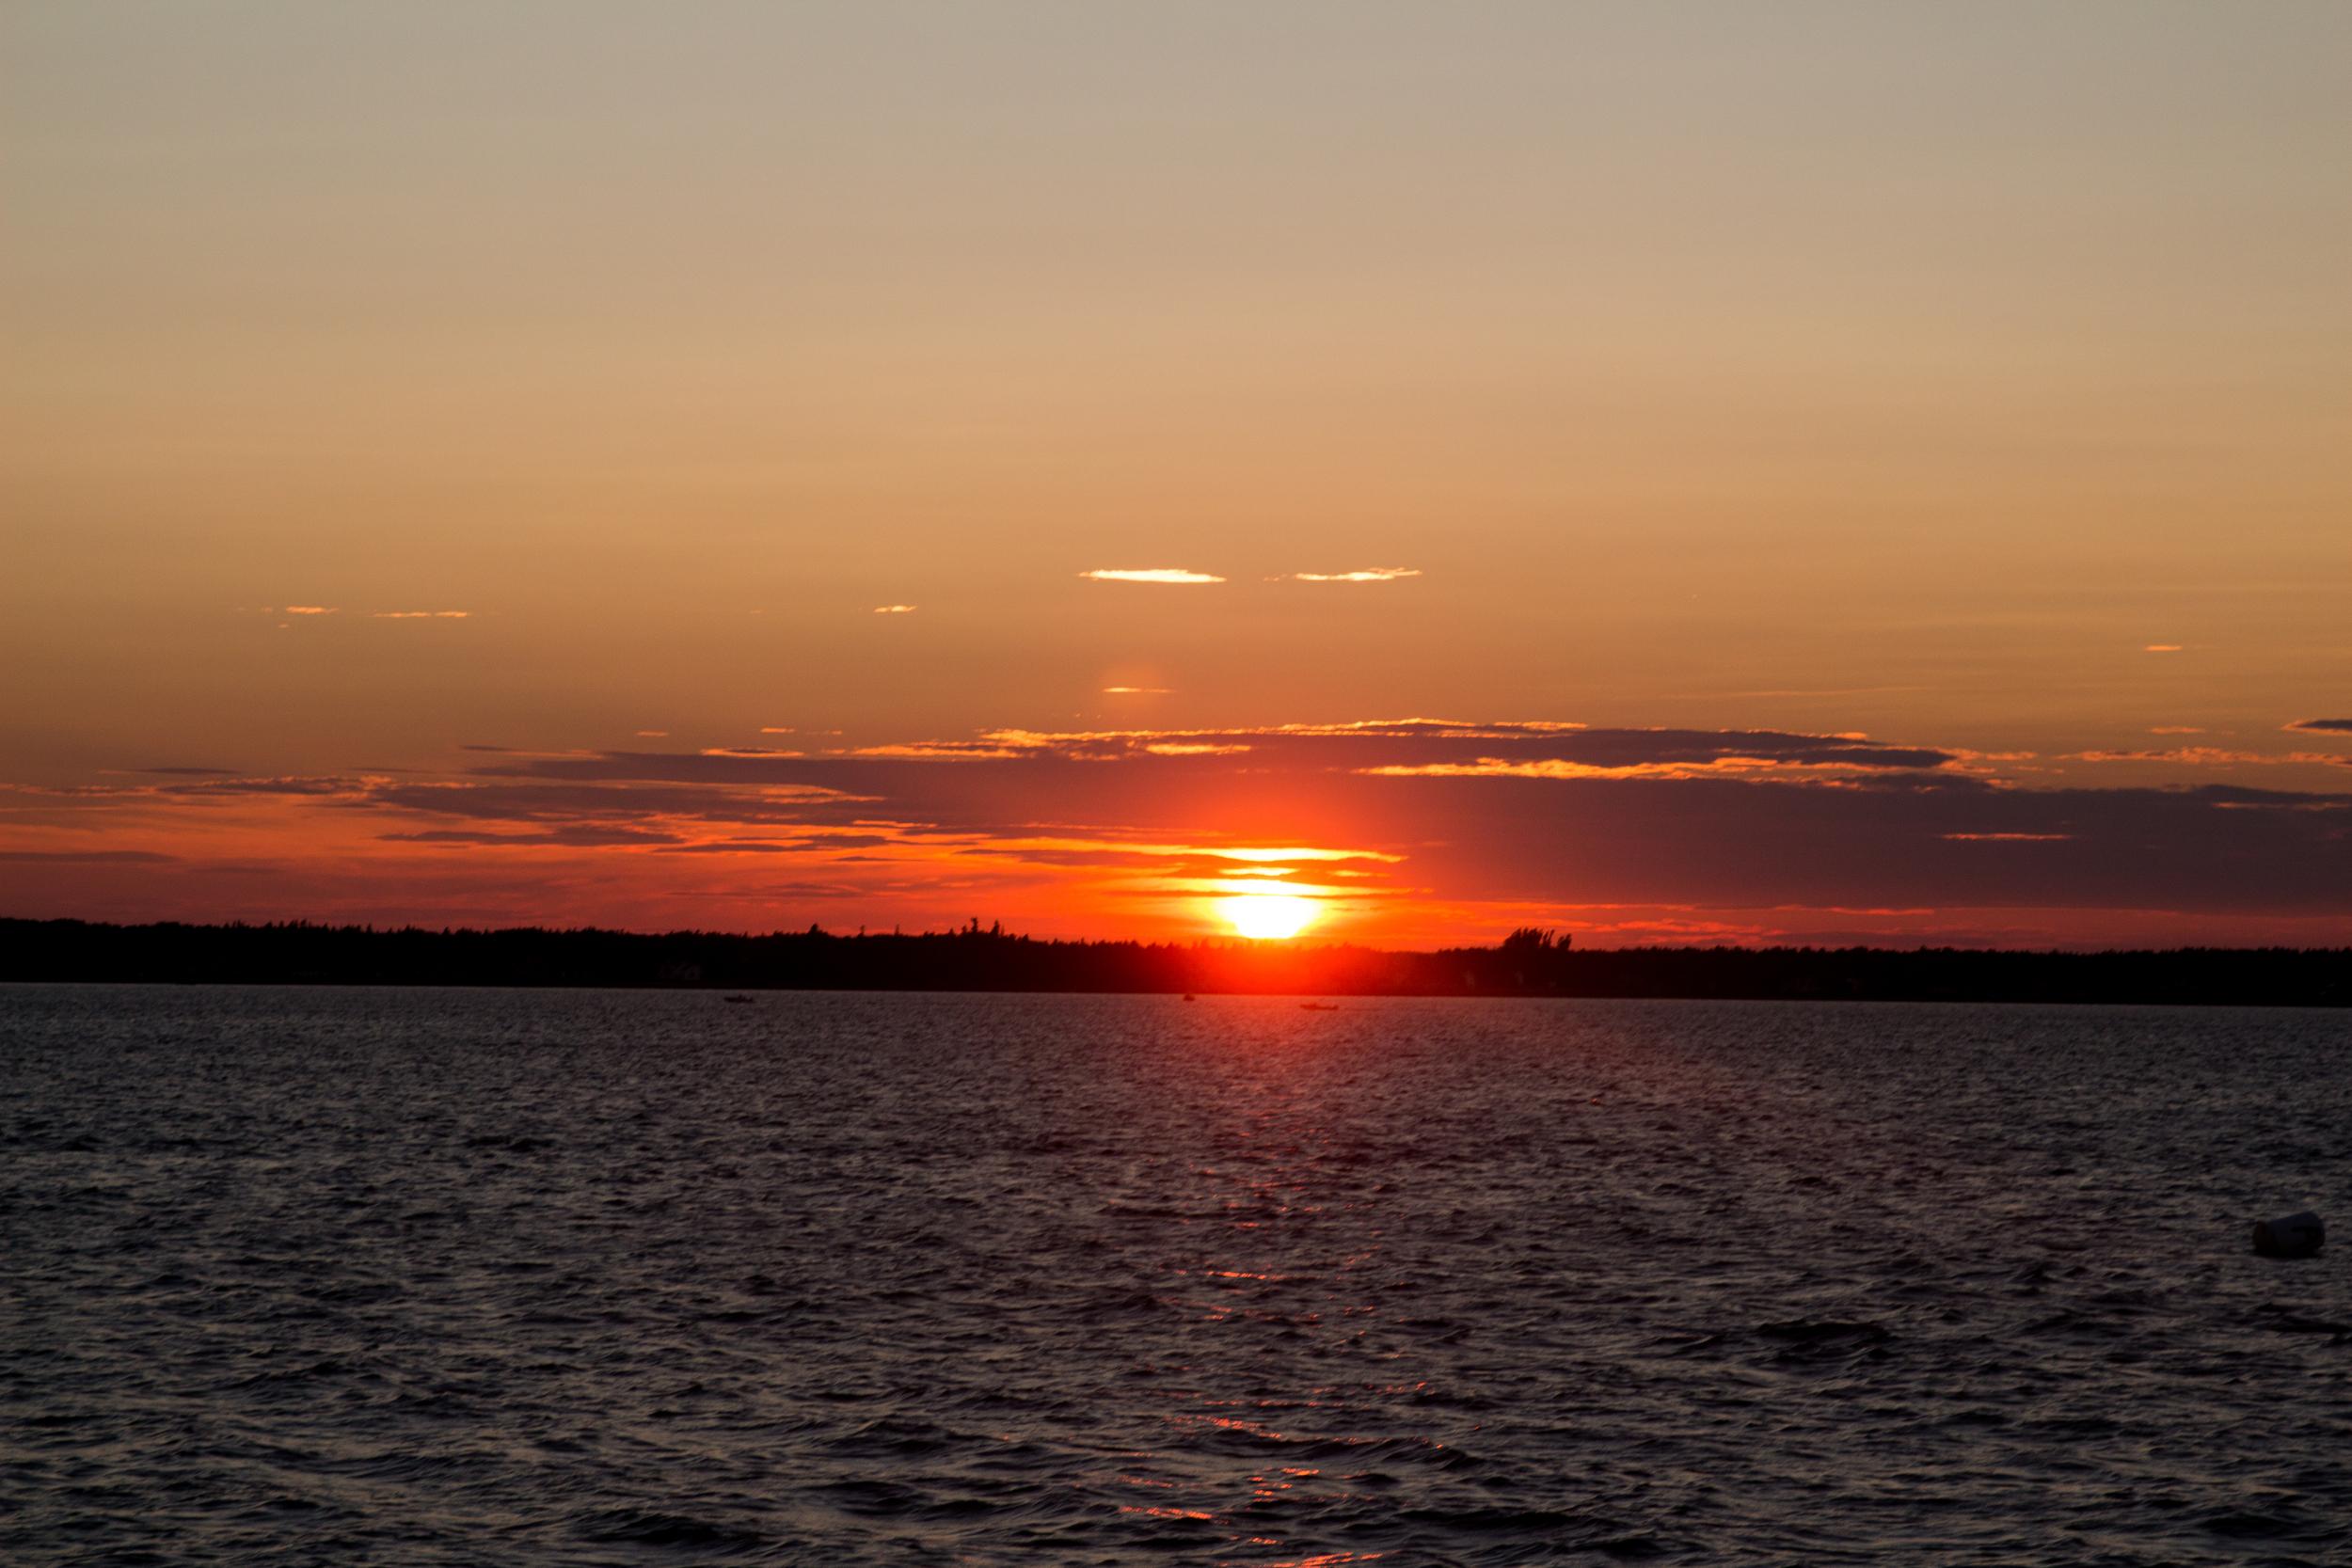 Sunset over the Shediac Wharf. Shediac, New Brunswick.